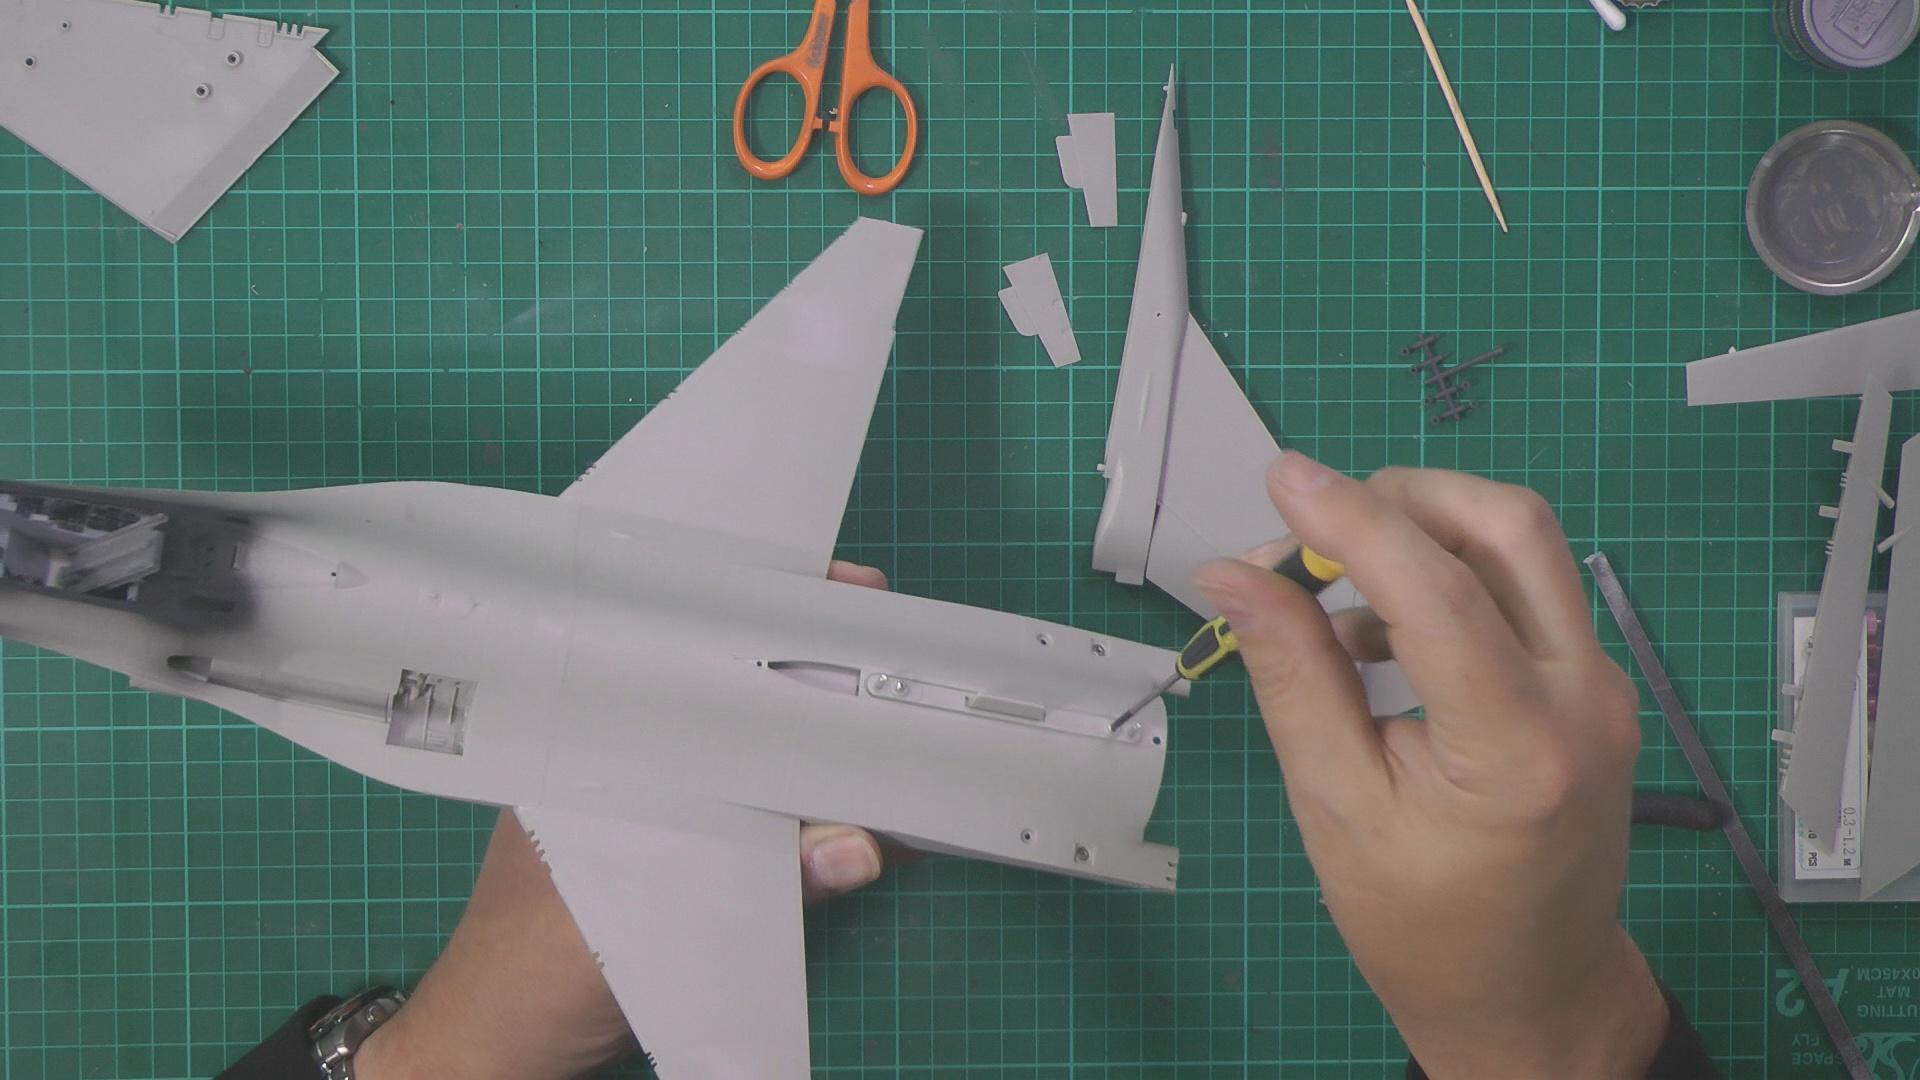 Tamiya F16 Part 6 Pic 2.jpg